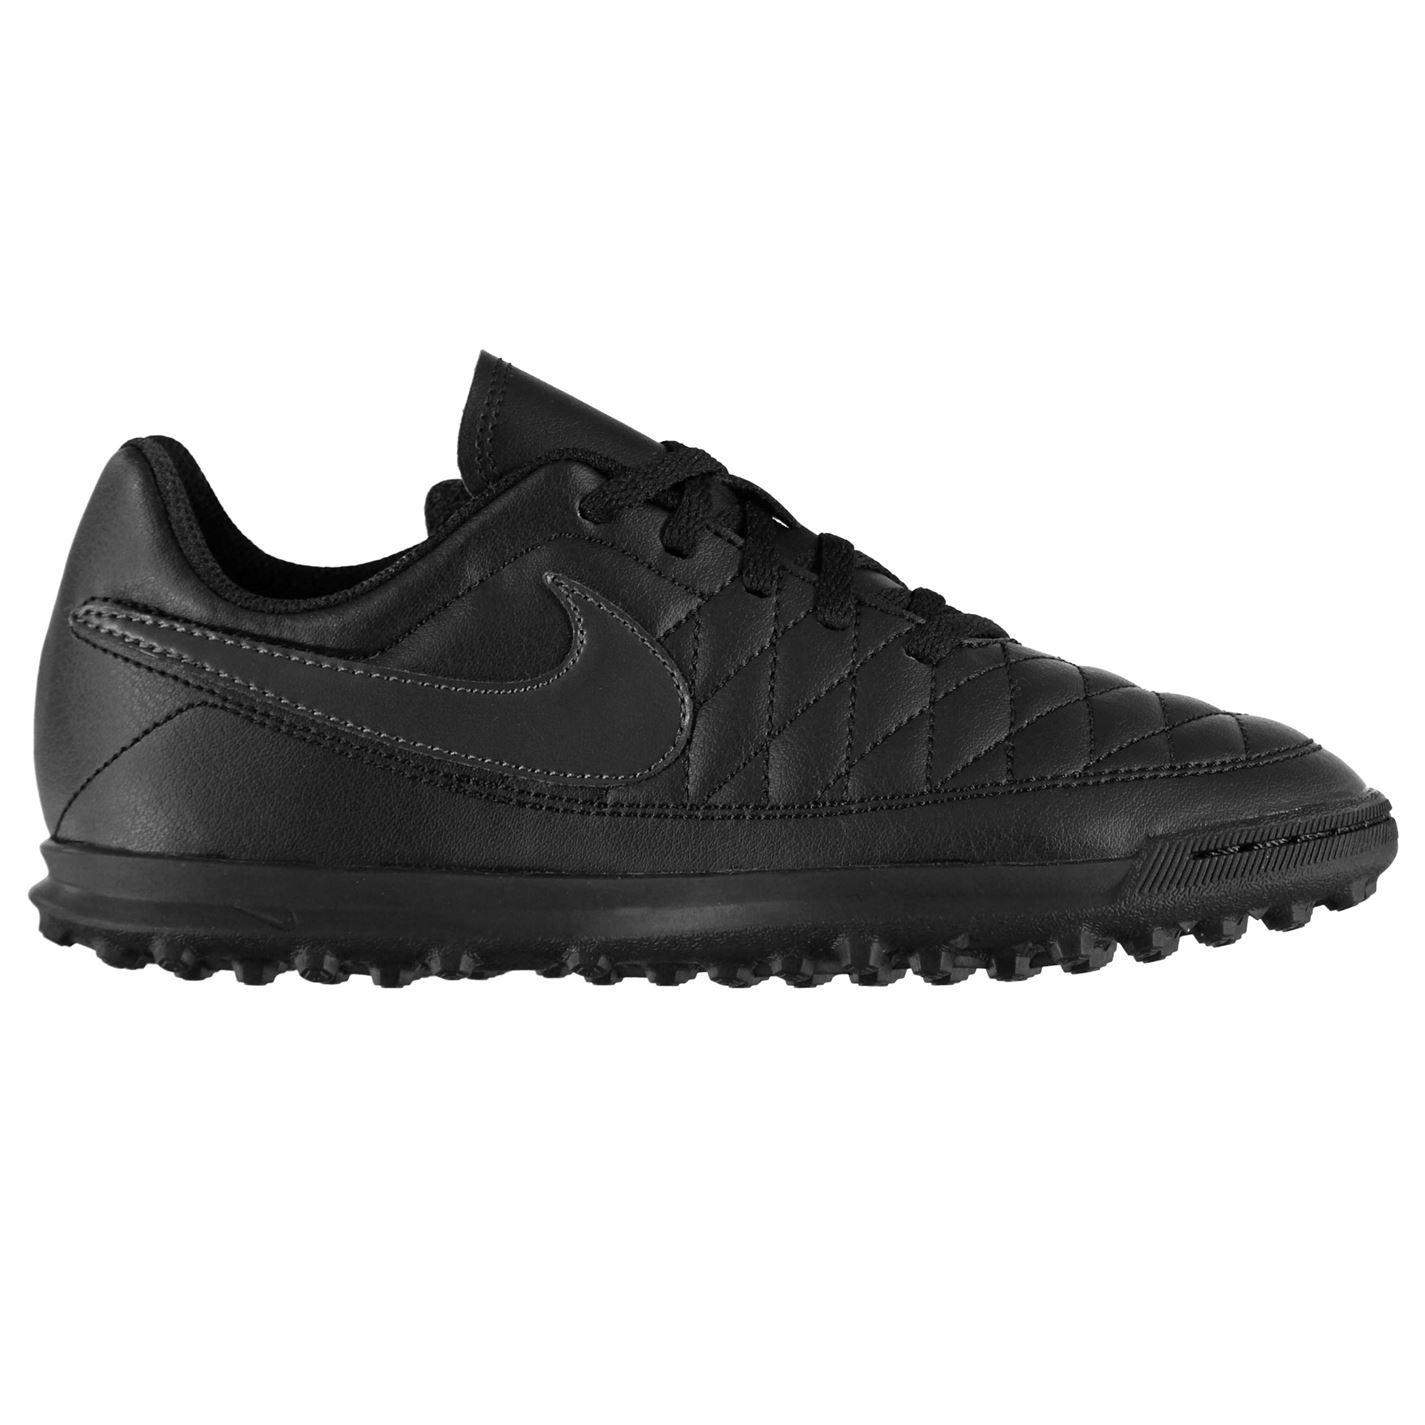 Nike-majestry-Astro-Turf-Football-Baskets-Juniors-Football-Baskets-Chaussures miniature 4